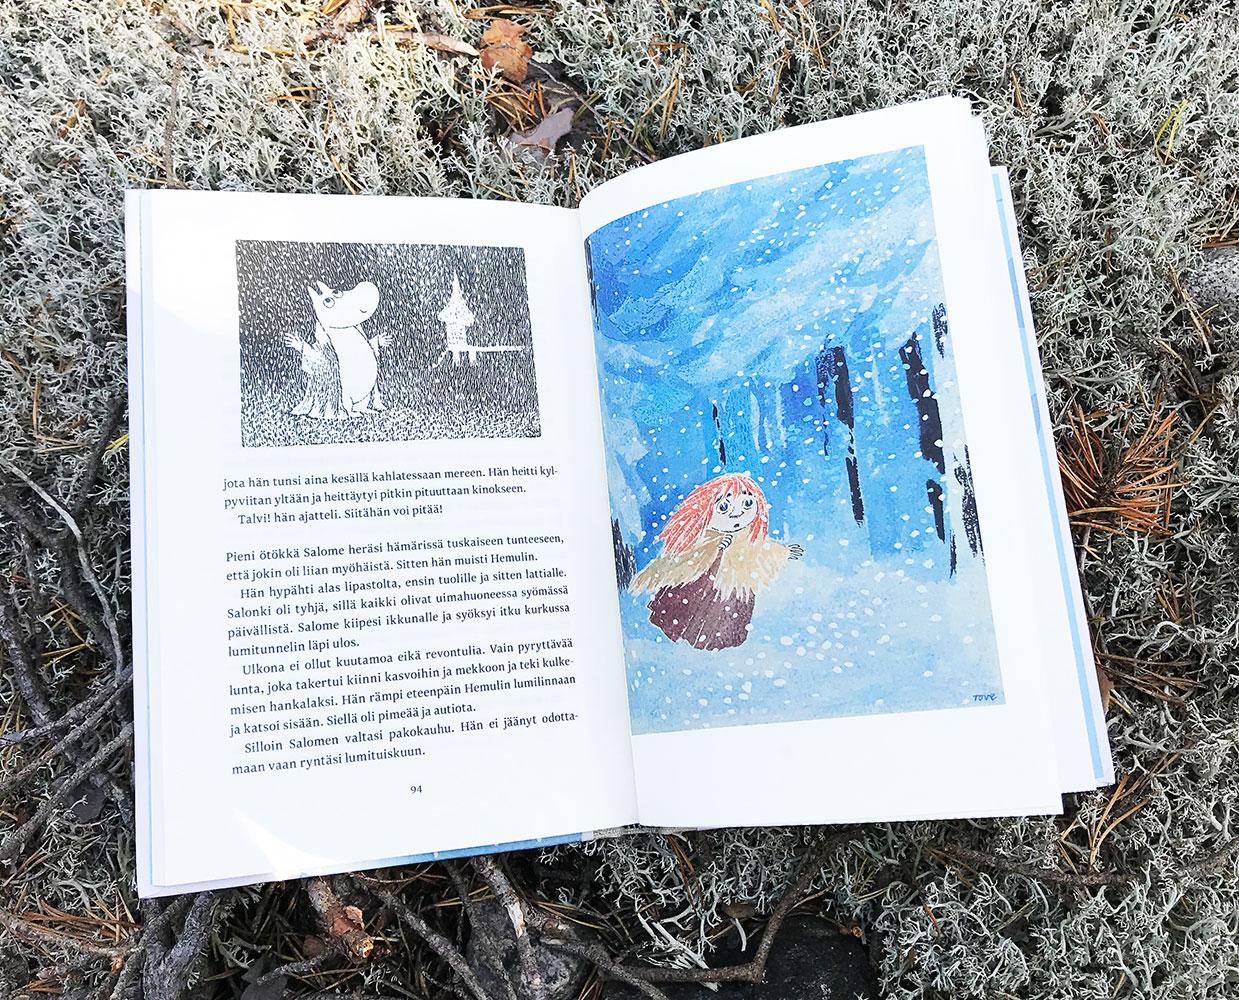 Taikatalvi Muumi-kirjan värikuvat